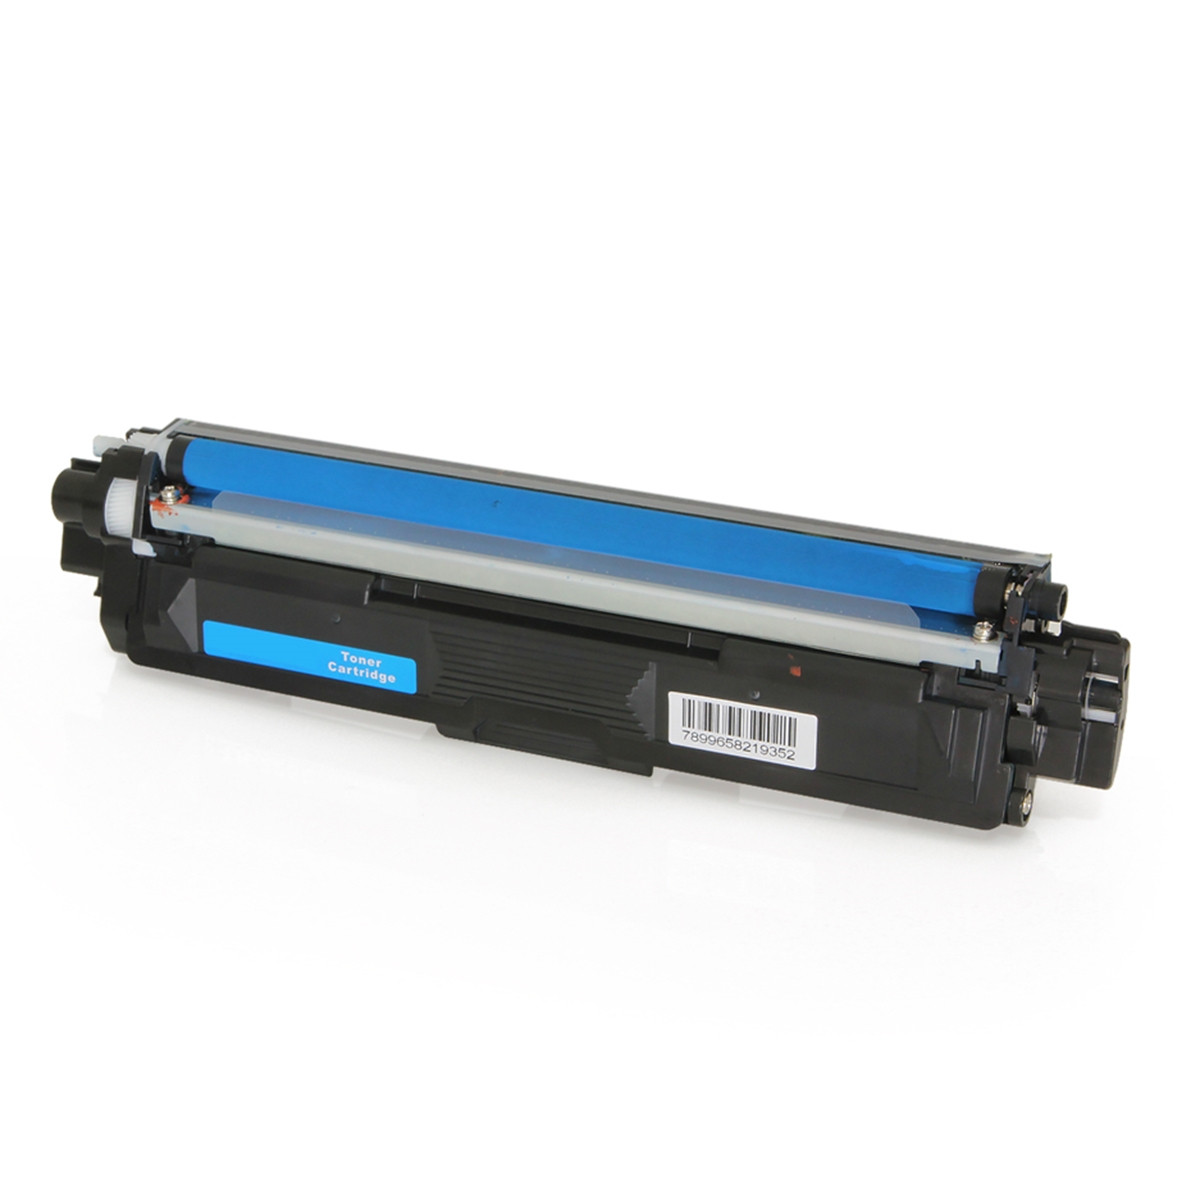 Toner Compatível com Brother TN-221C TN221 Ciano | HL3140 HL3170 DCP9020 MFC9130 | Premium 1.4k